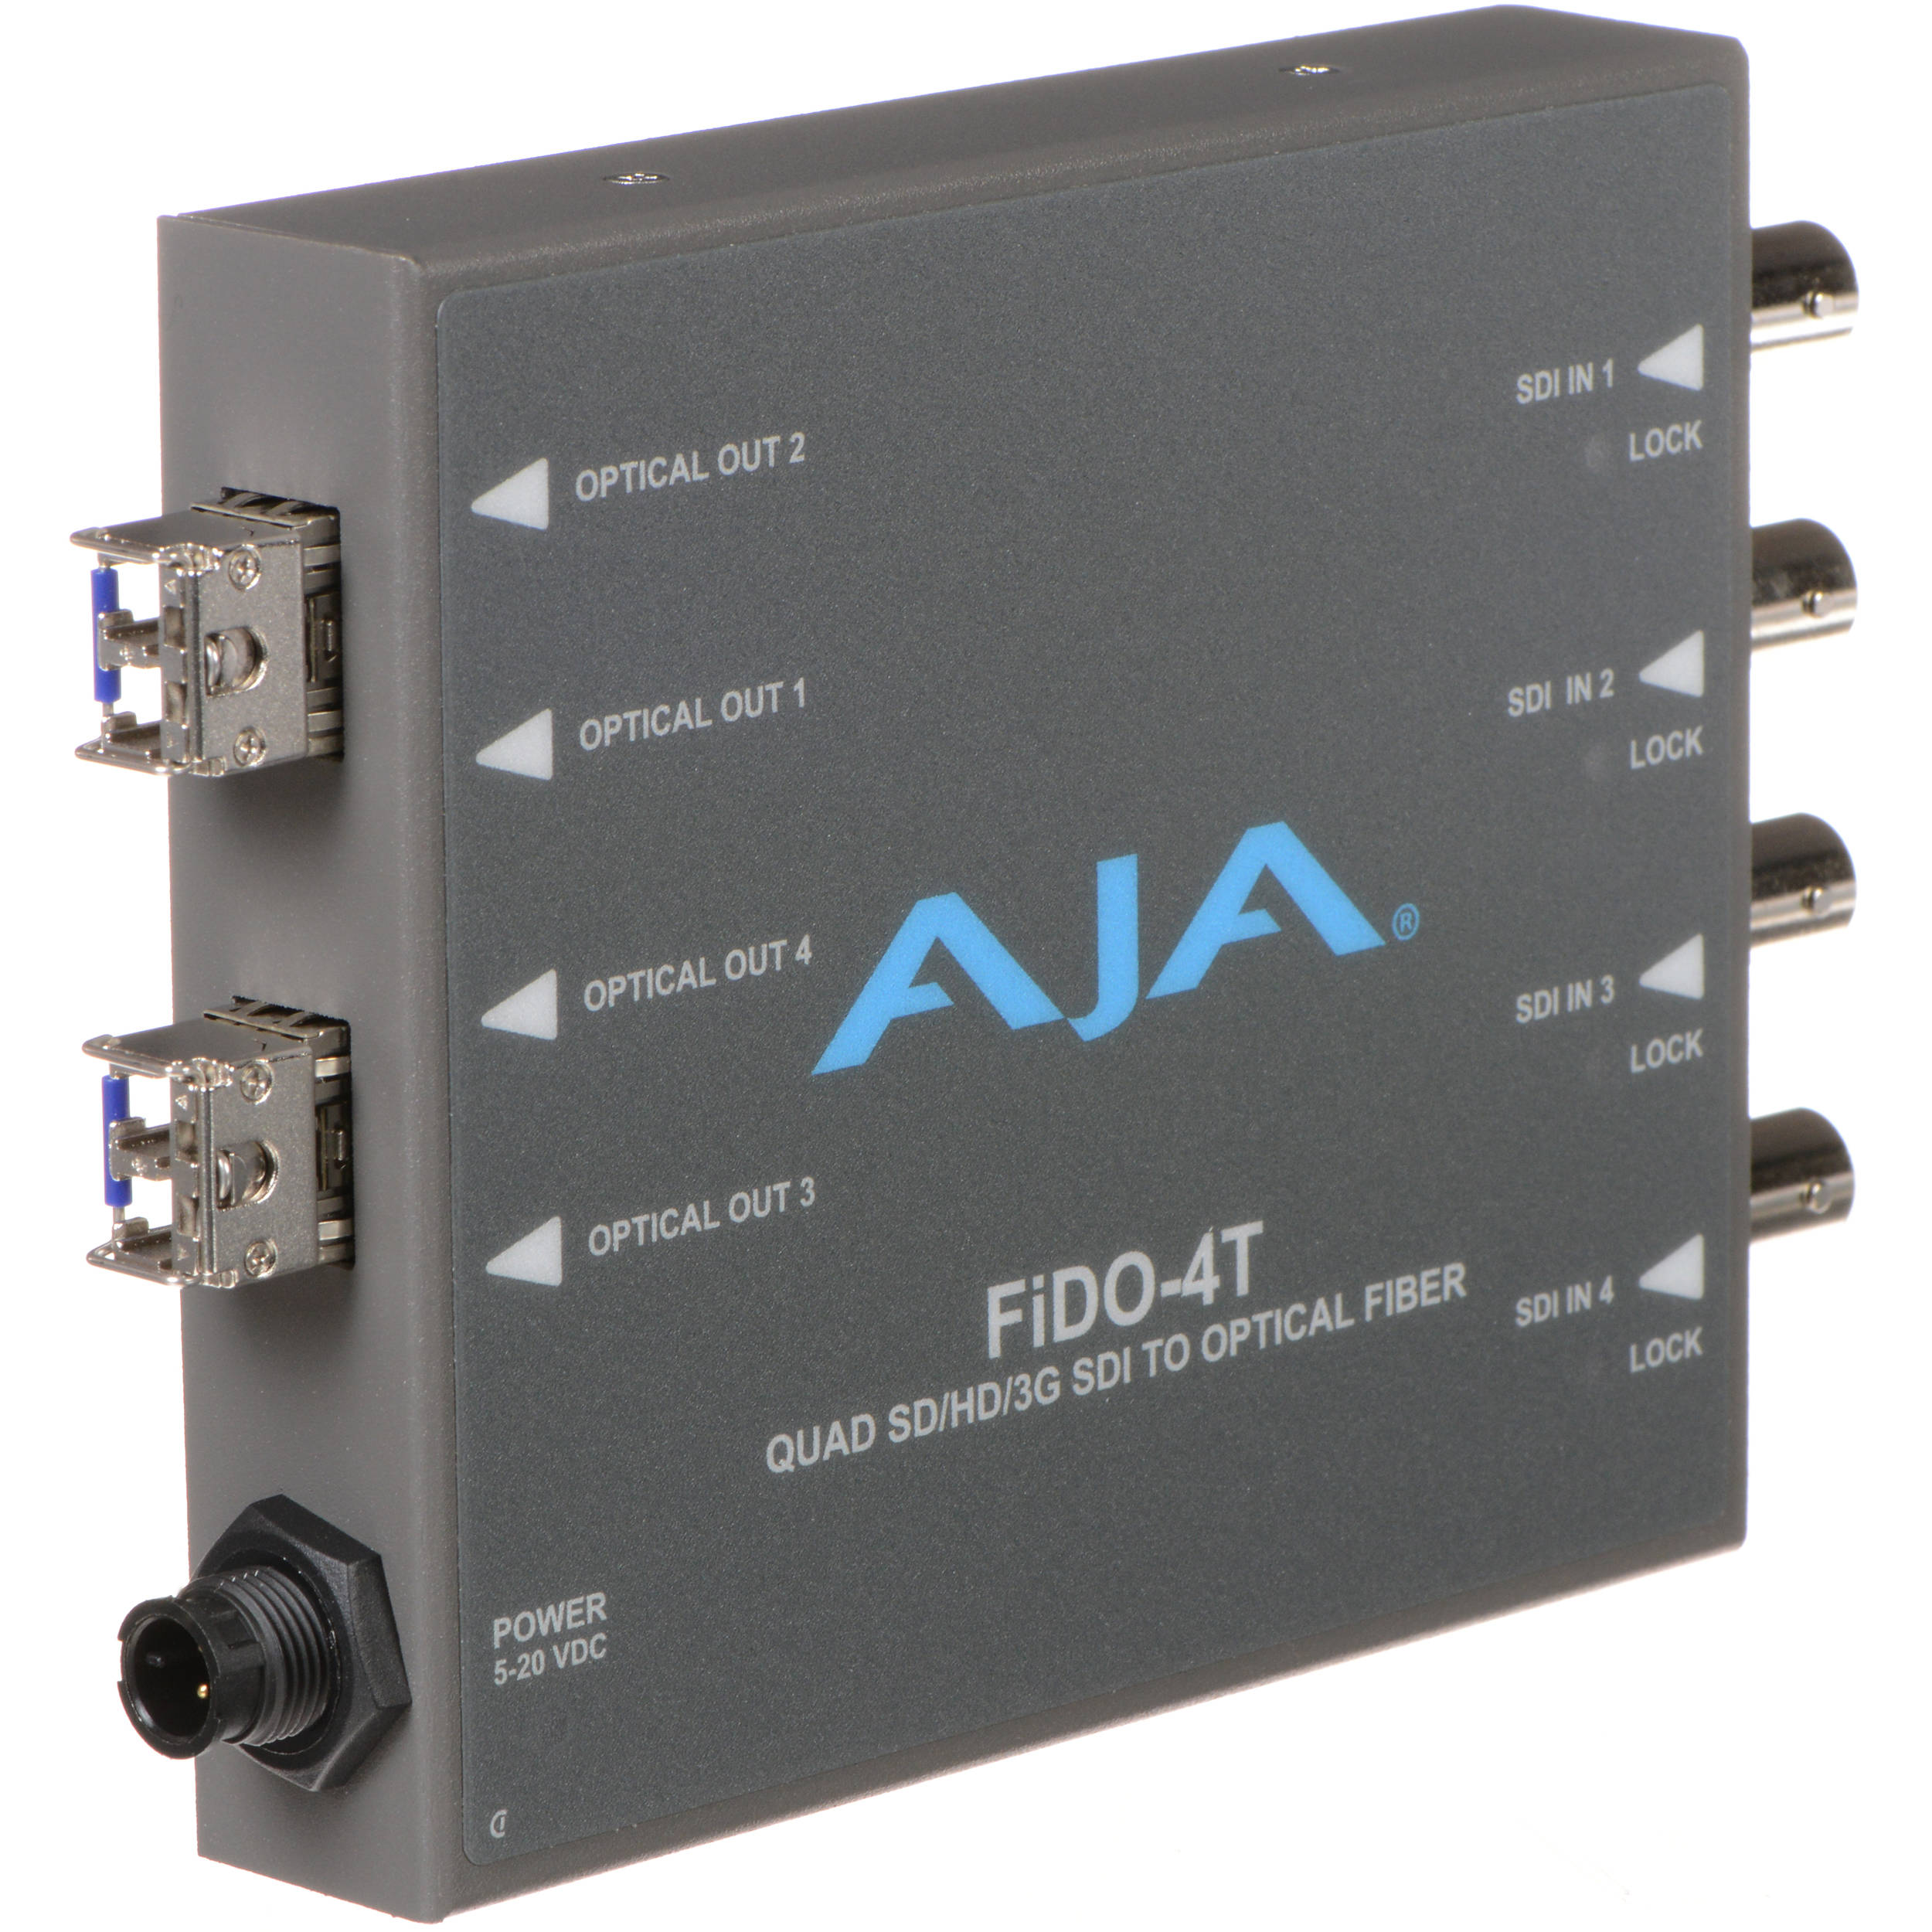 Https C Product 1162883 Reg Rain Sound Effects Generator Circuit Voice Recorder Aja Fido 4t 4 Ch Sd Hd 3g Sdi To Lc 1162557